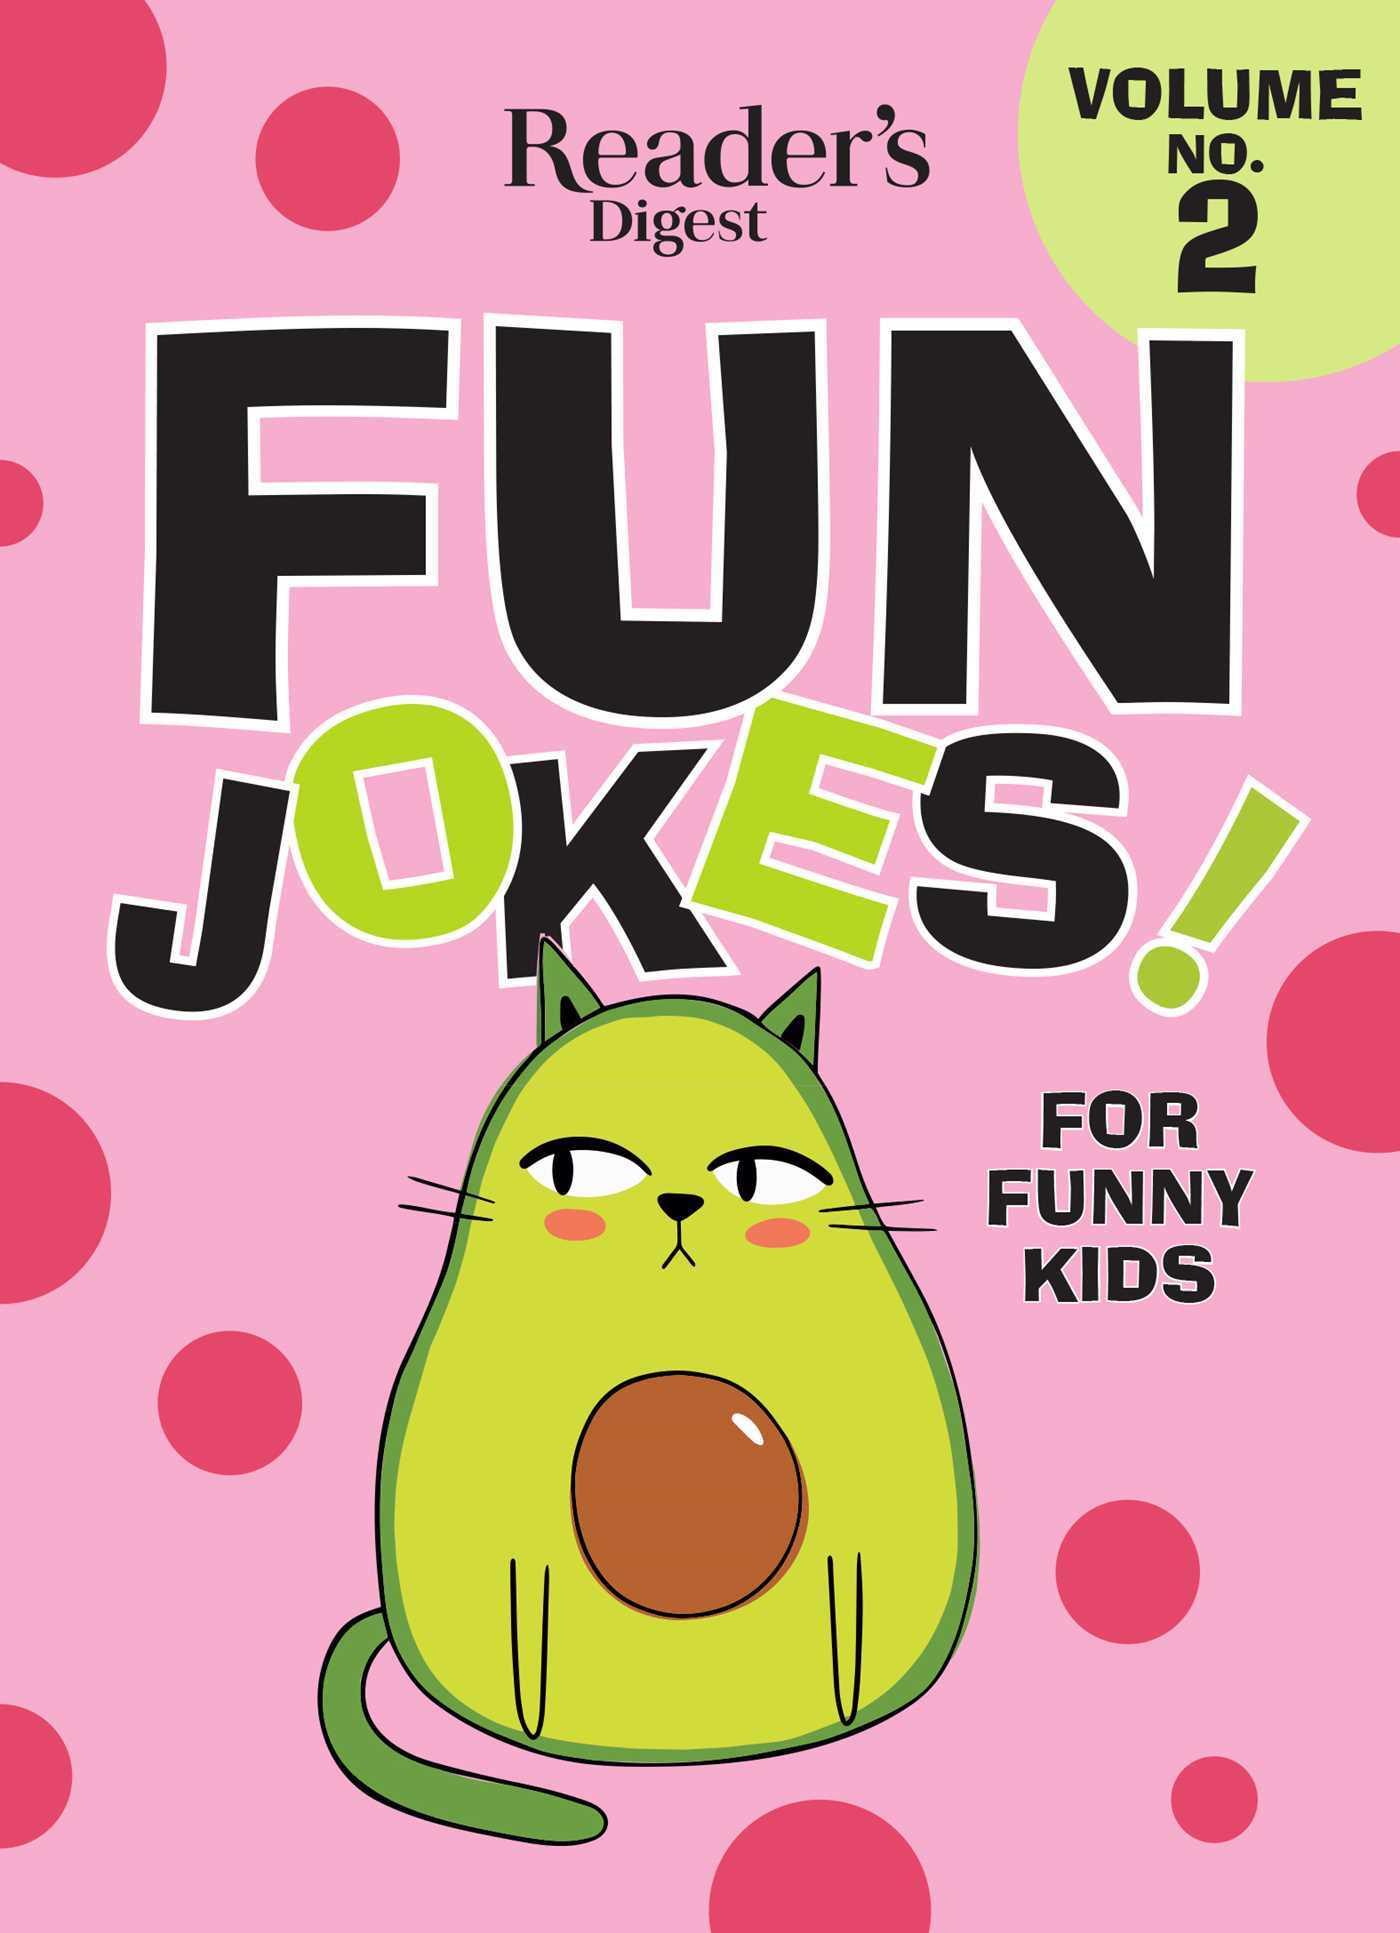 Reader's Digest Fun Jokes for Funny Kids Vol. 2